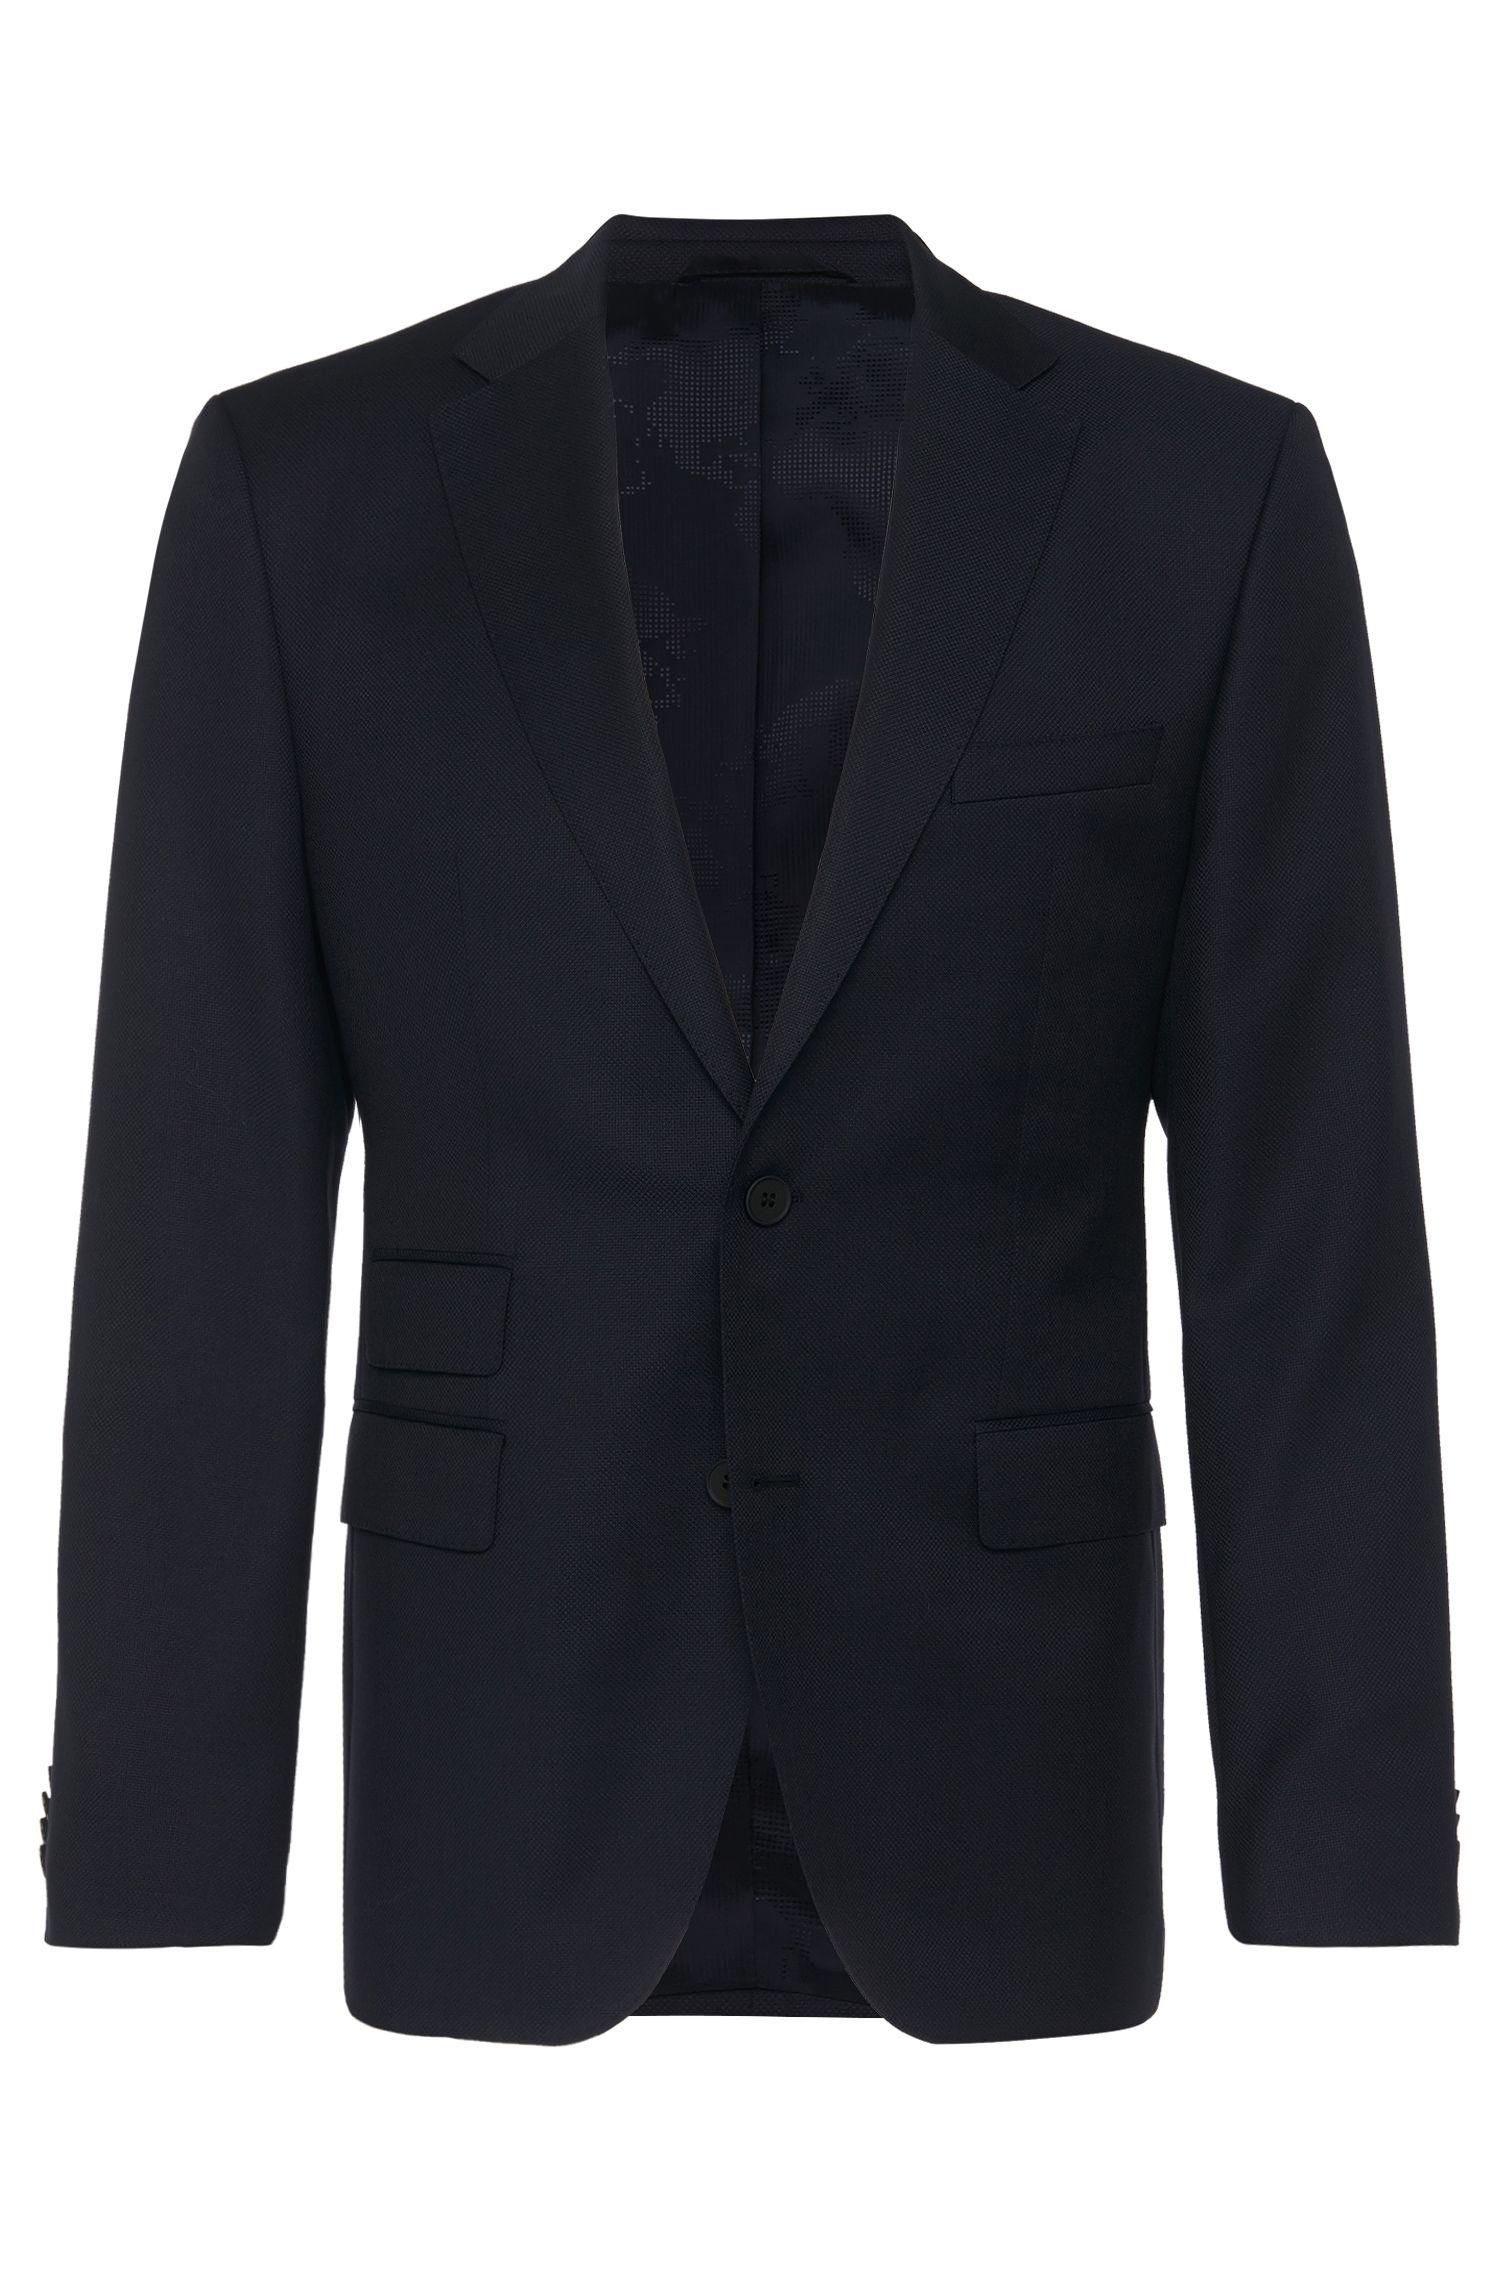 'Jet' | Regular Fit, Virgin Wool Traveler Sport Coat